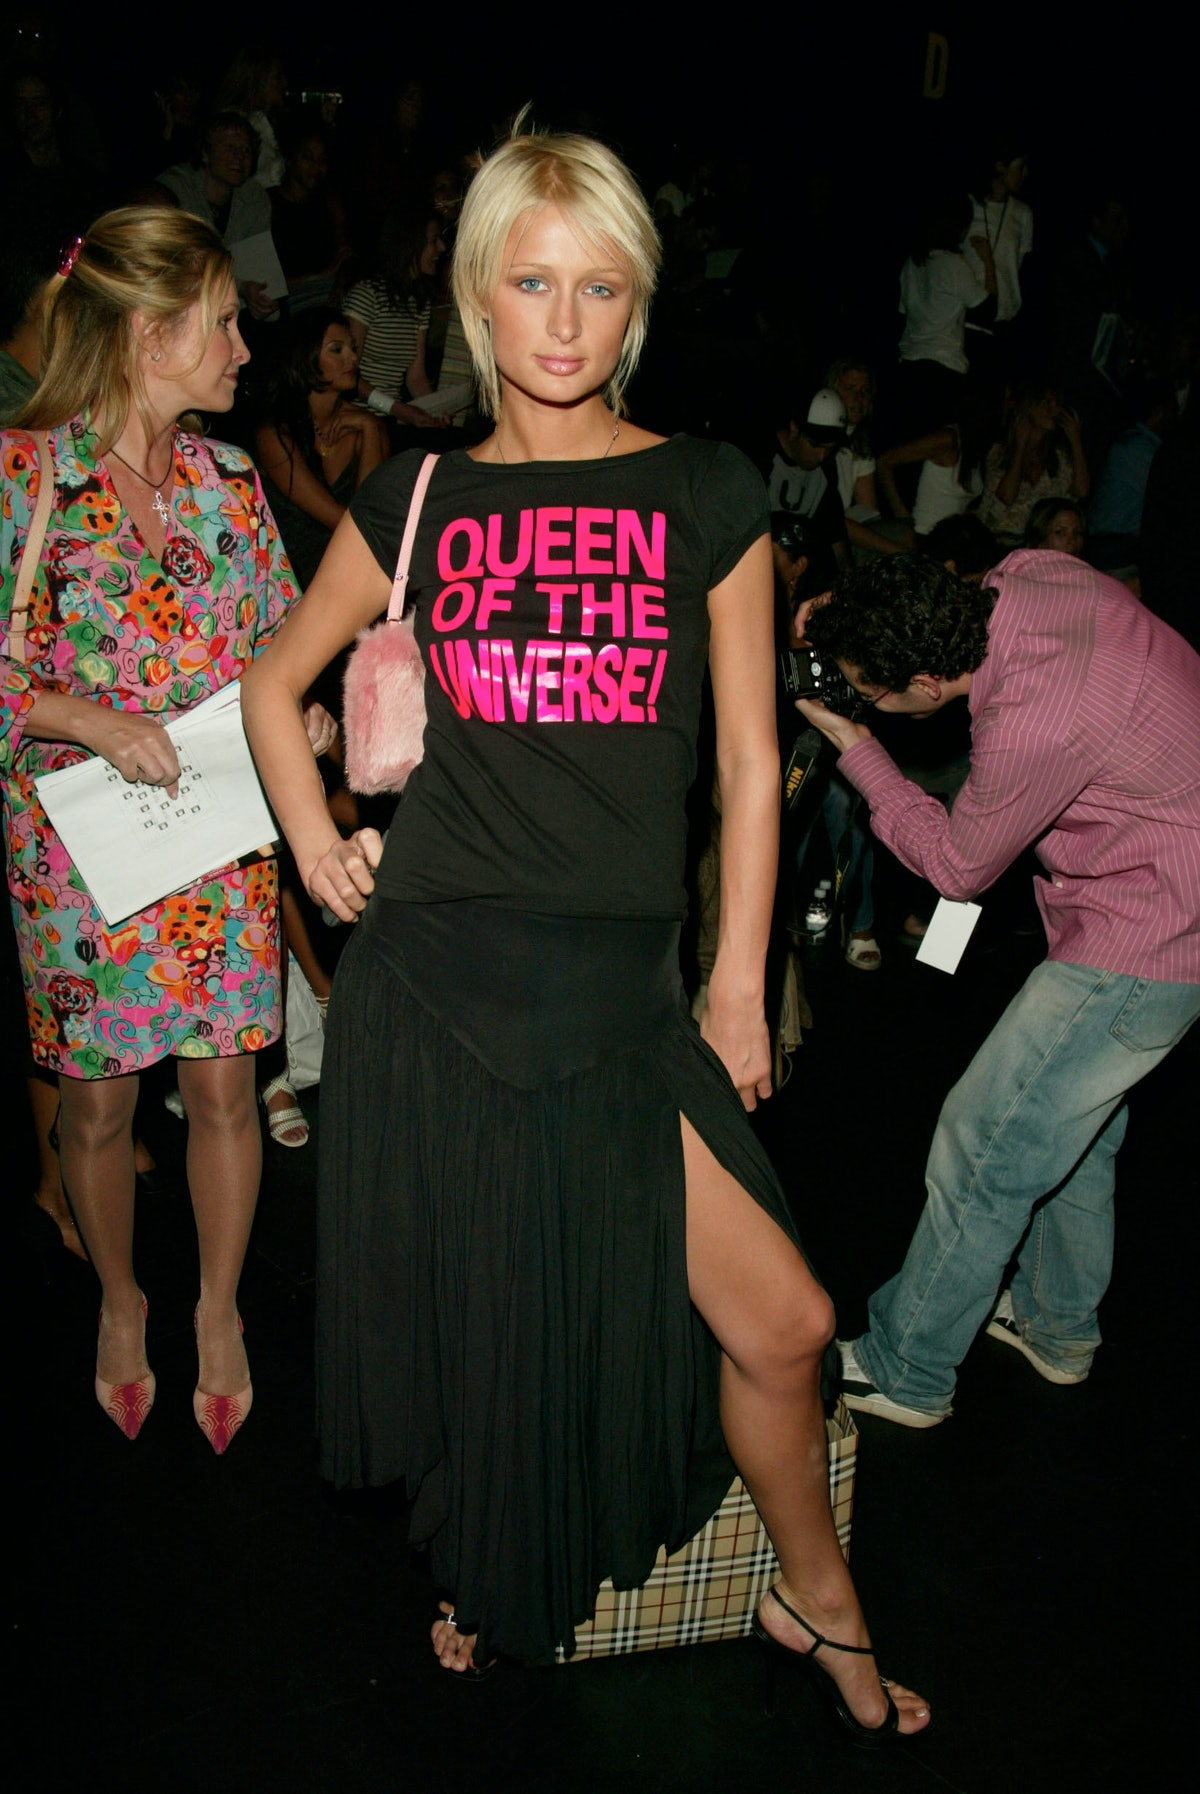 Paris wearing queen of the universe black tee